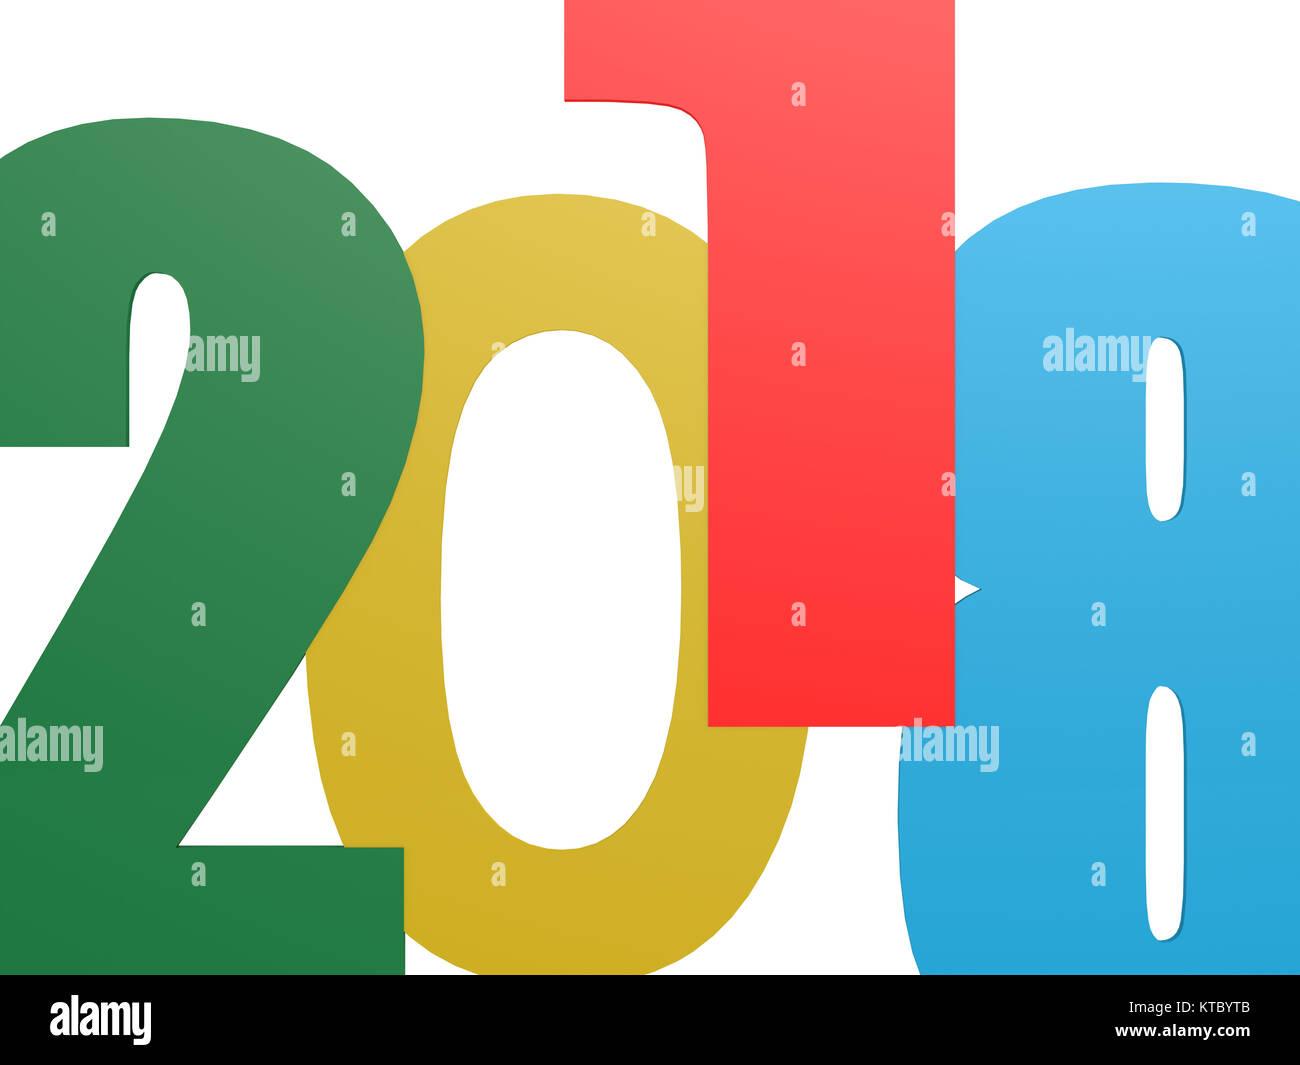 2018 happy new year elegant stockfotos 2018 happy new year elegant bilder alamy. Black Bedroom Furniture Sets. Home Design Ideas